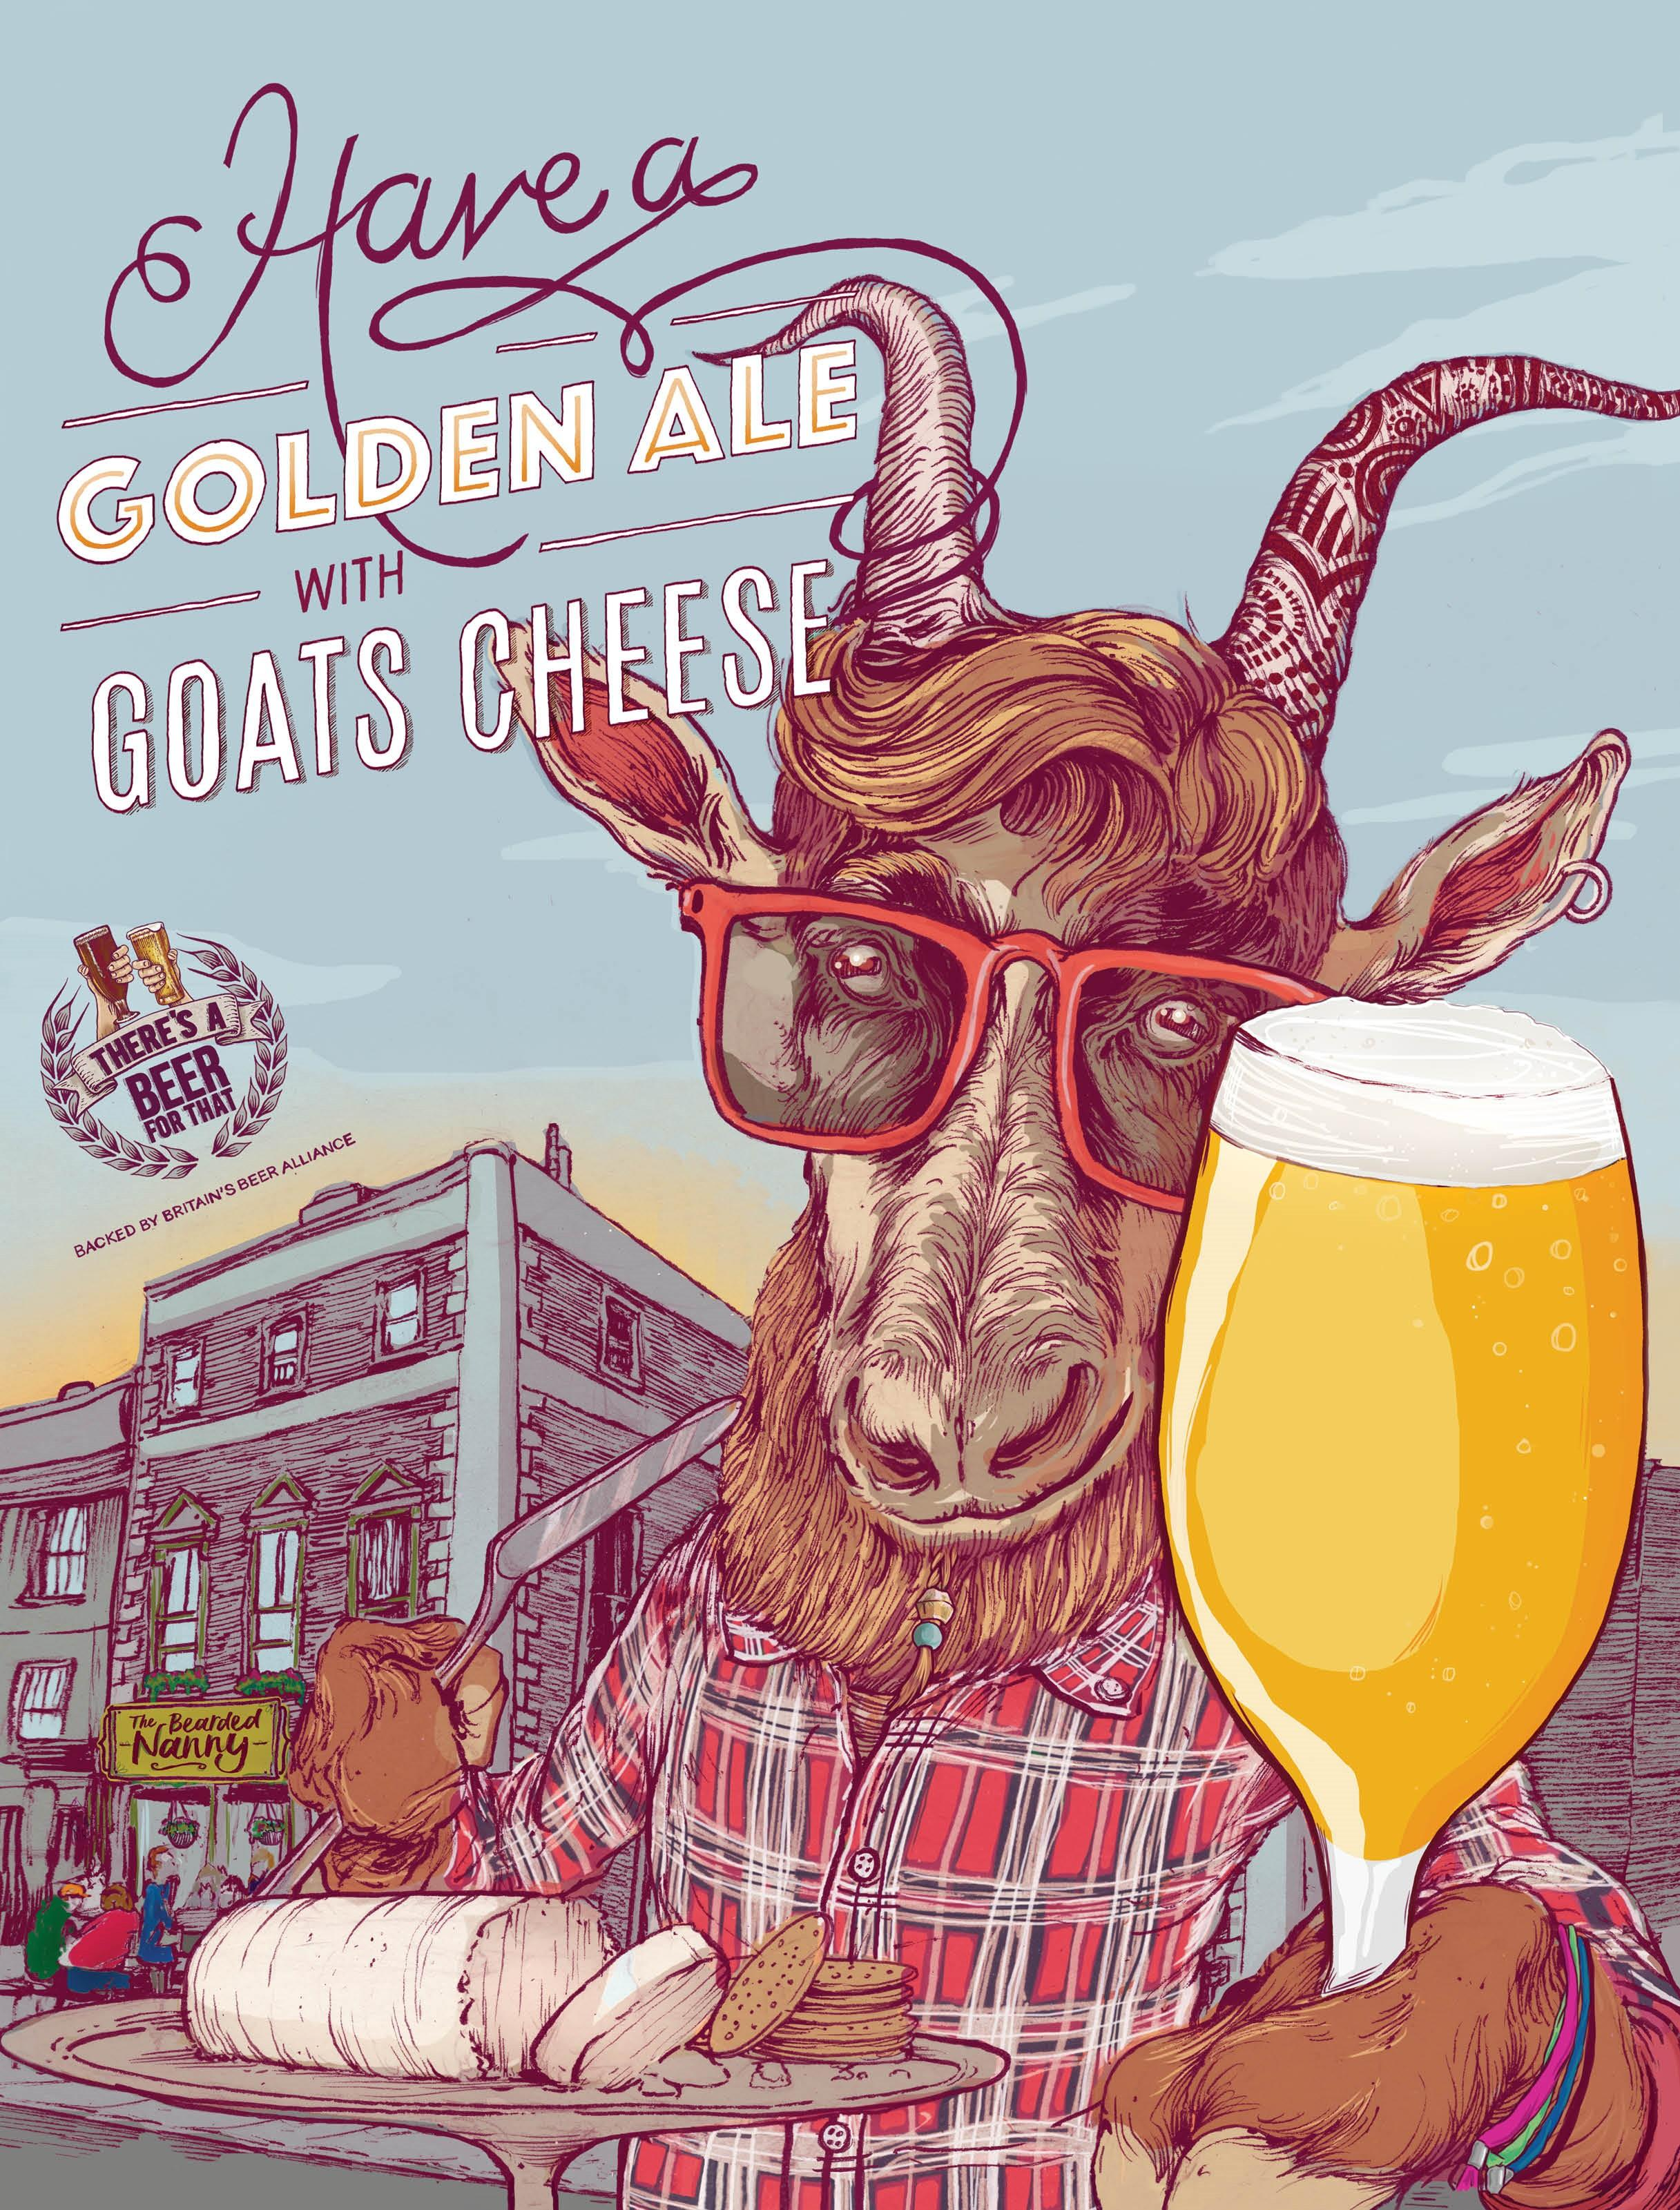 Britain's Beer Alliance Print Ad - Goat